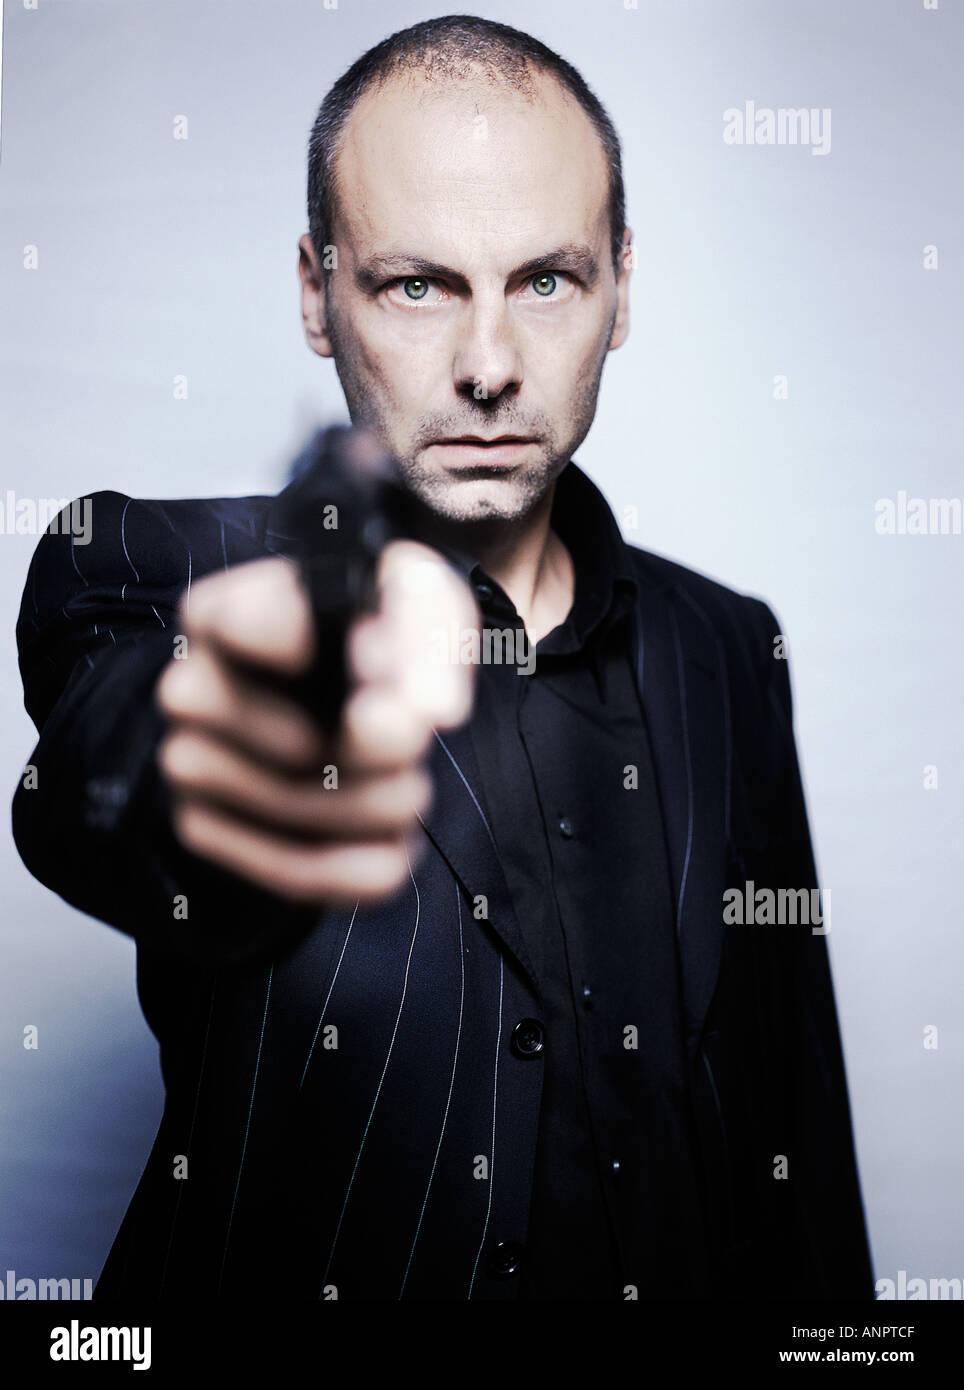 Gangster holding a gun - Stock Image